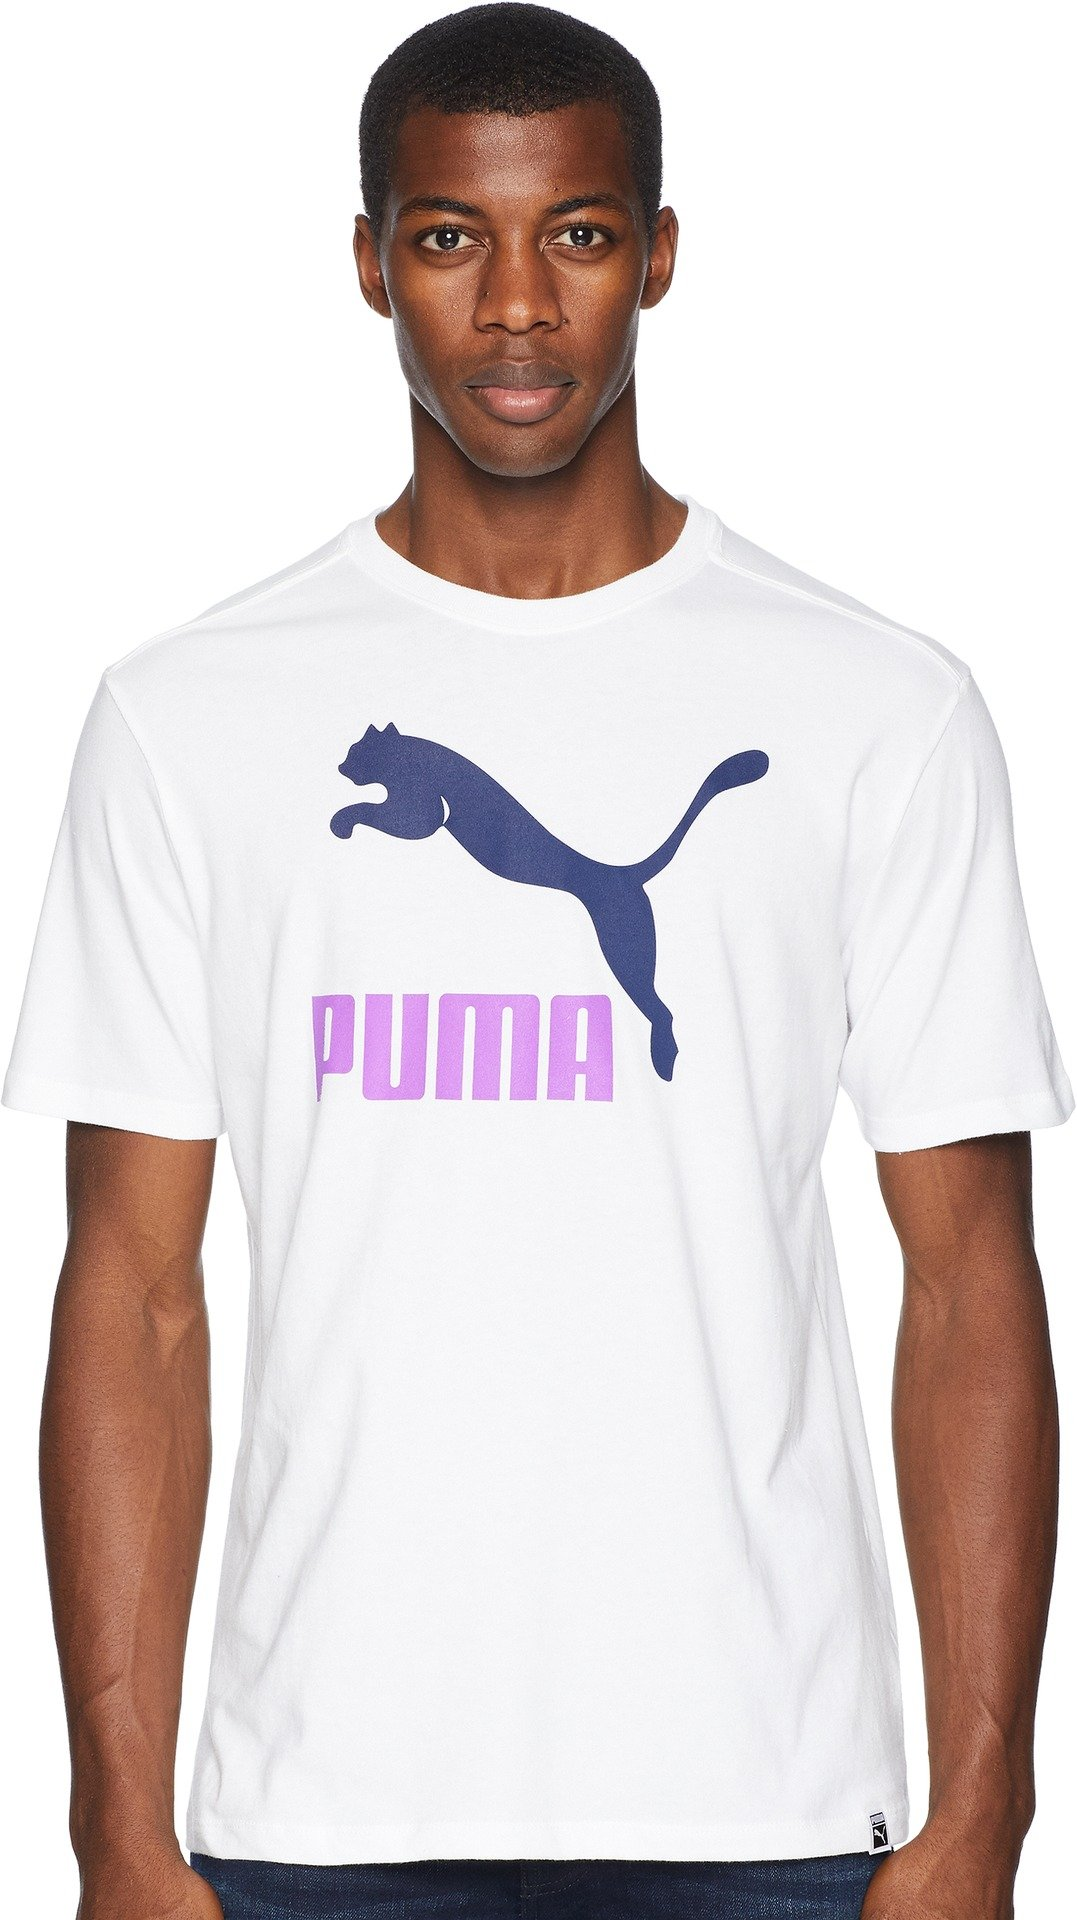 PUMA Men's Archive Life T-Shirt, White/Peacoat, S